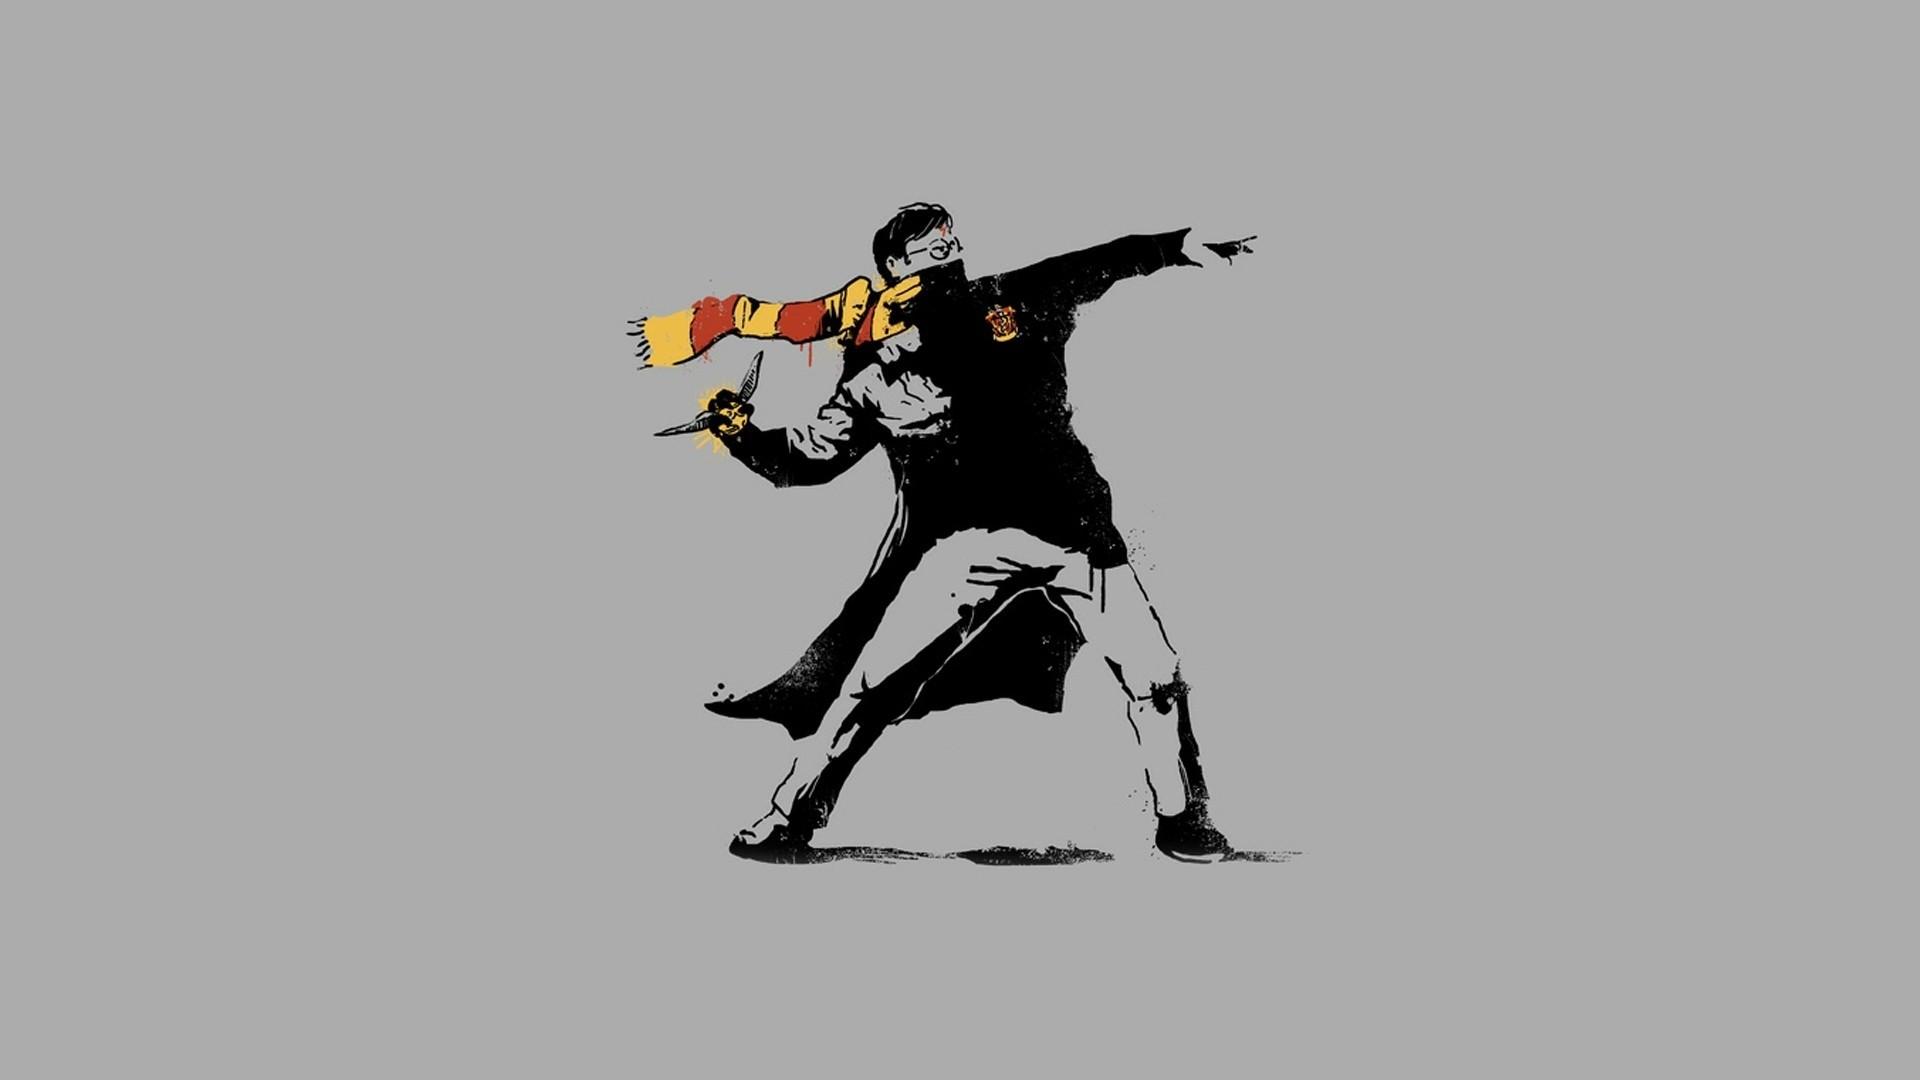 Banksy Donut HD Wallpaper | Wallpapers | Pinterest | Banksy and Hd wallpaper